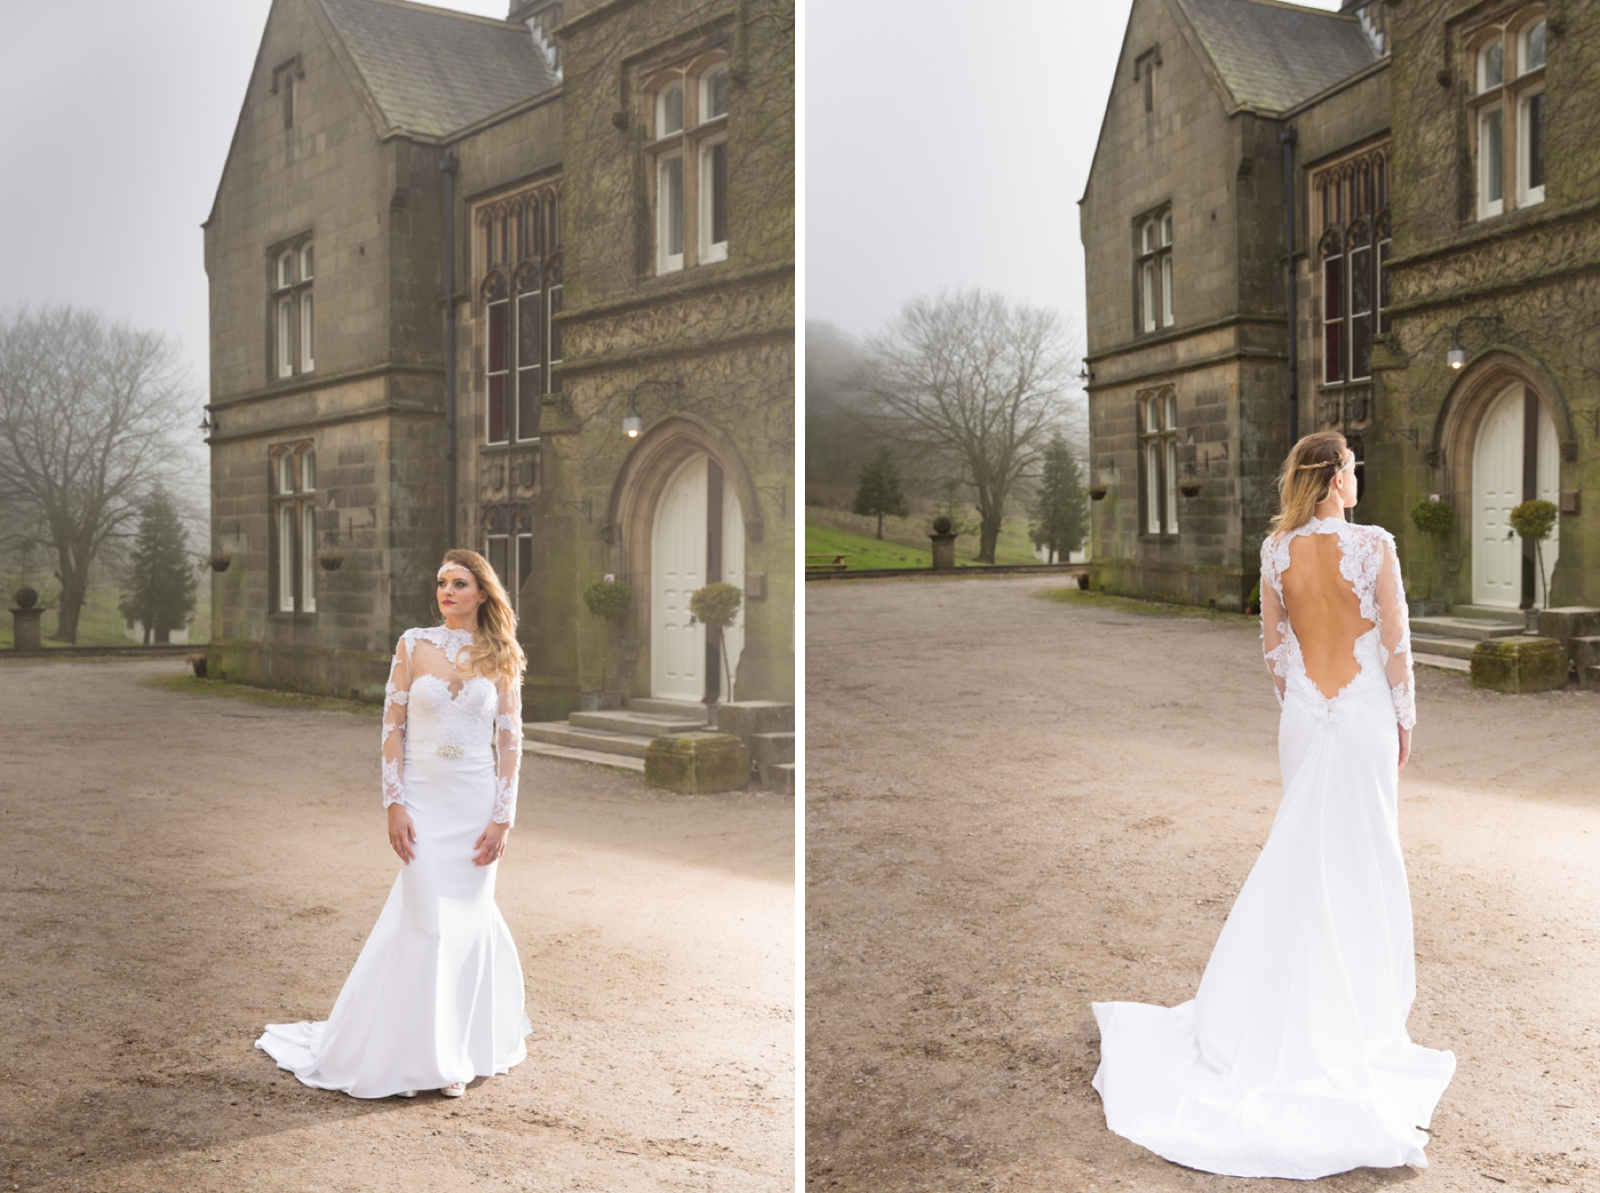 creative wedding photography at Hargate Hall